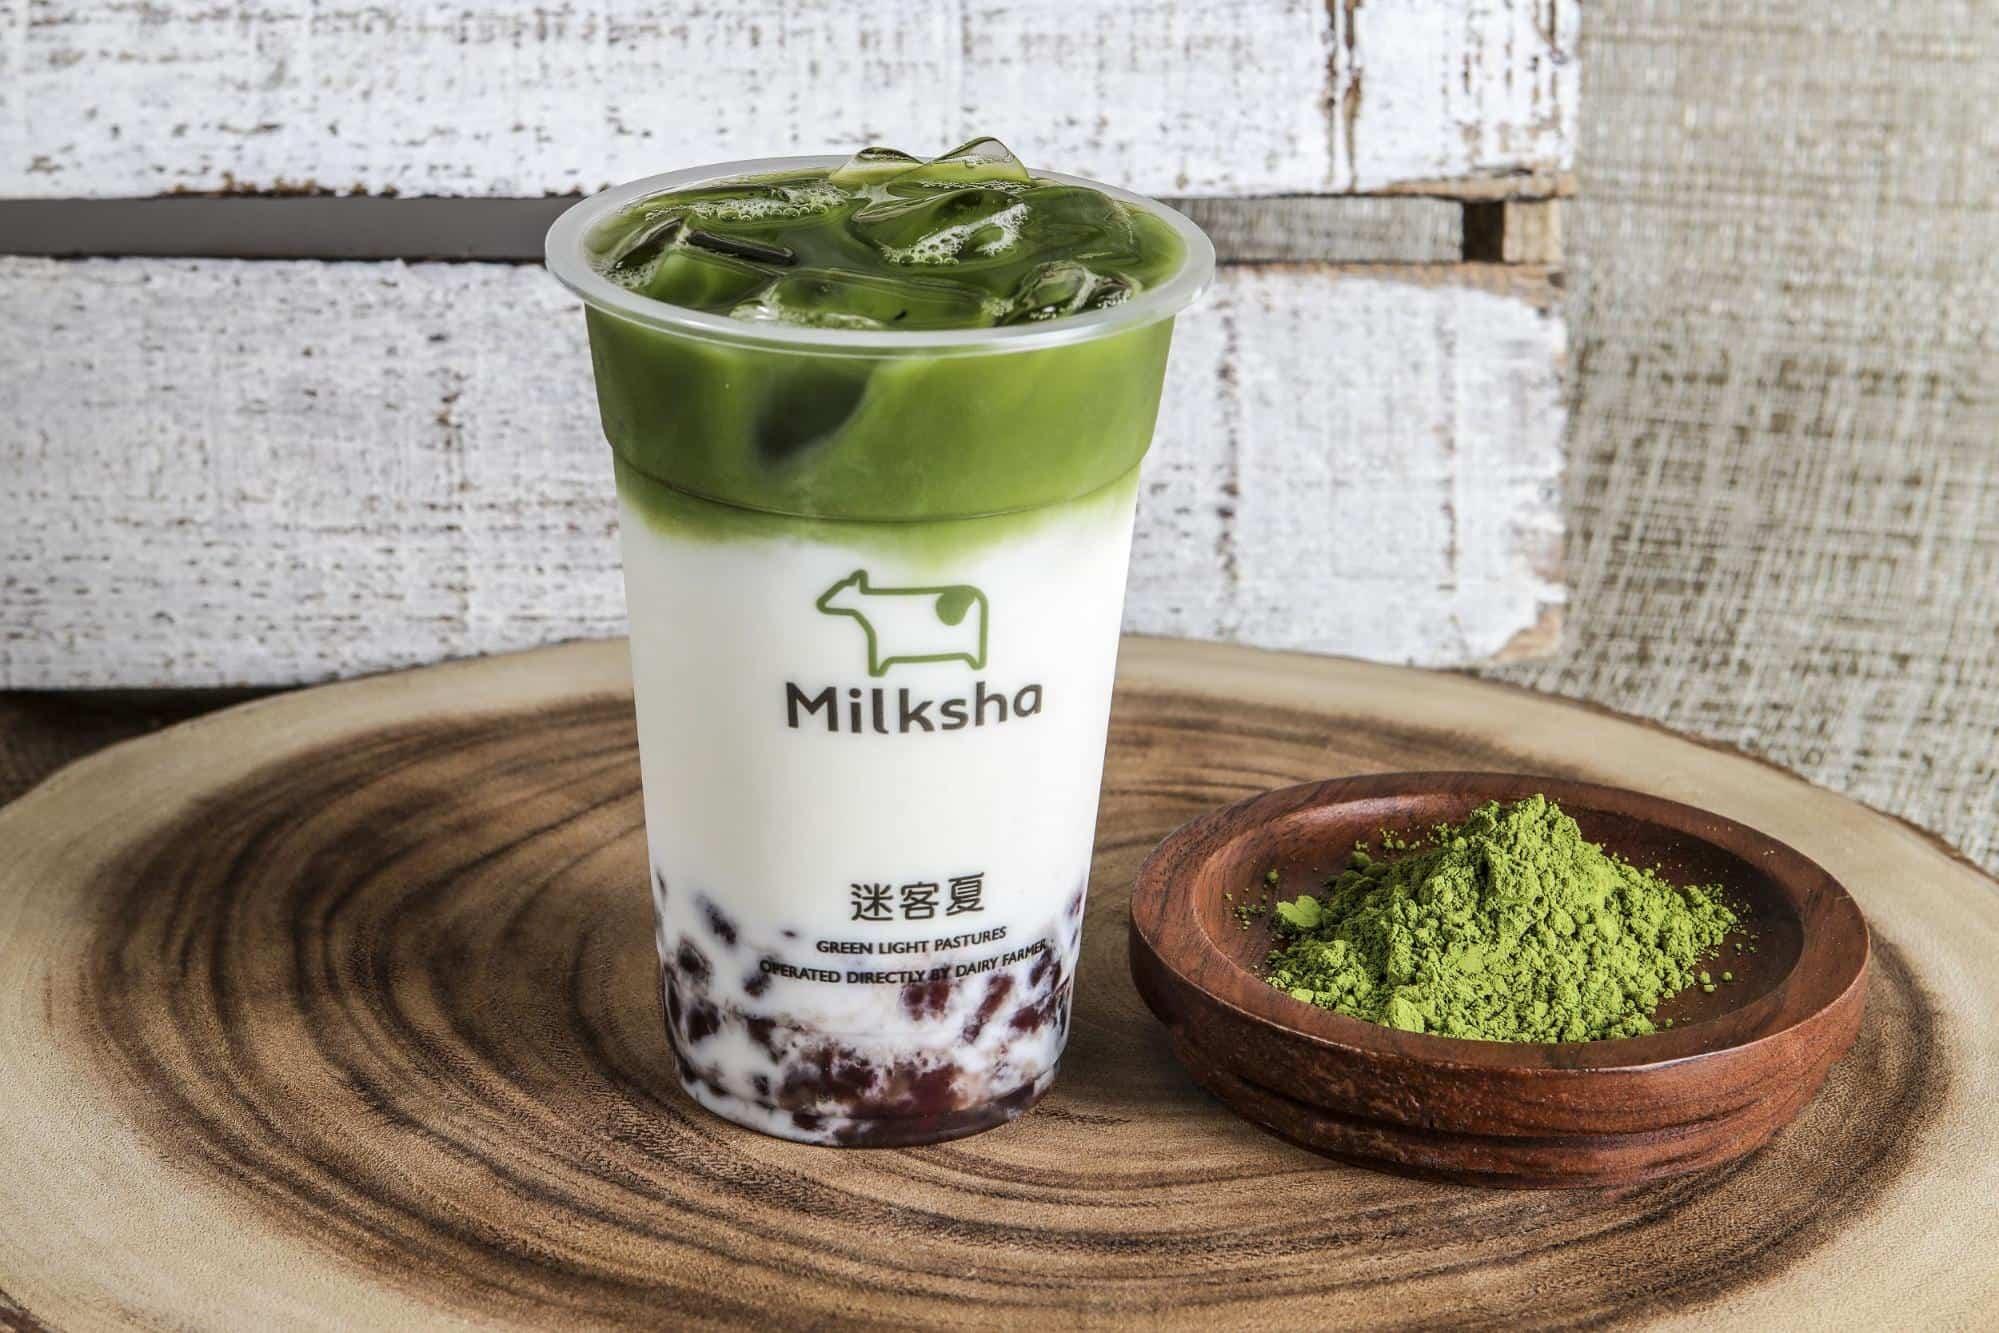 Milksha Singapore - Azuki Matcha